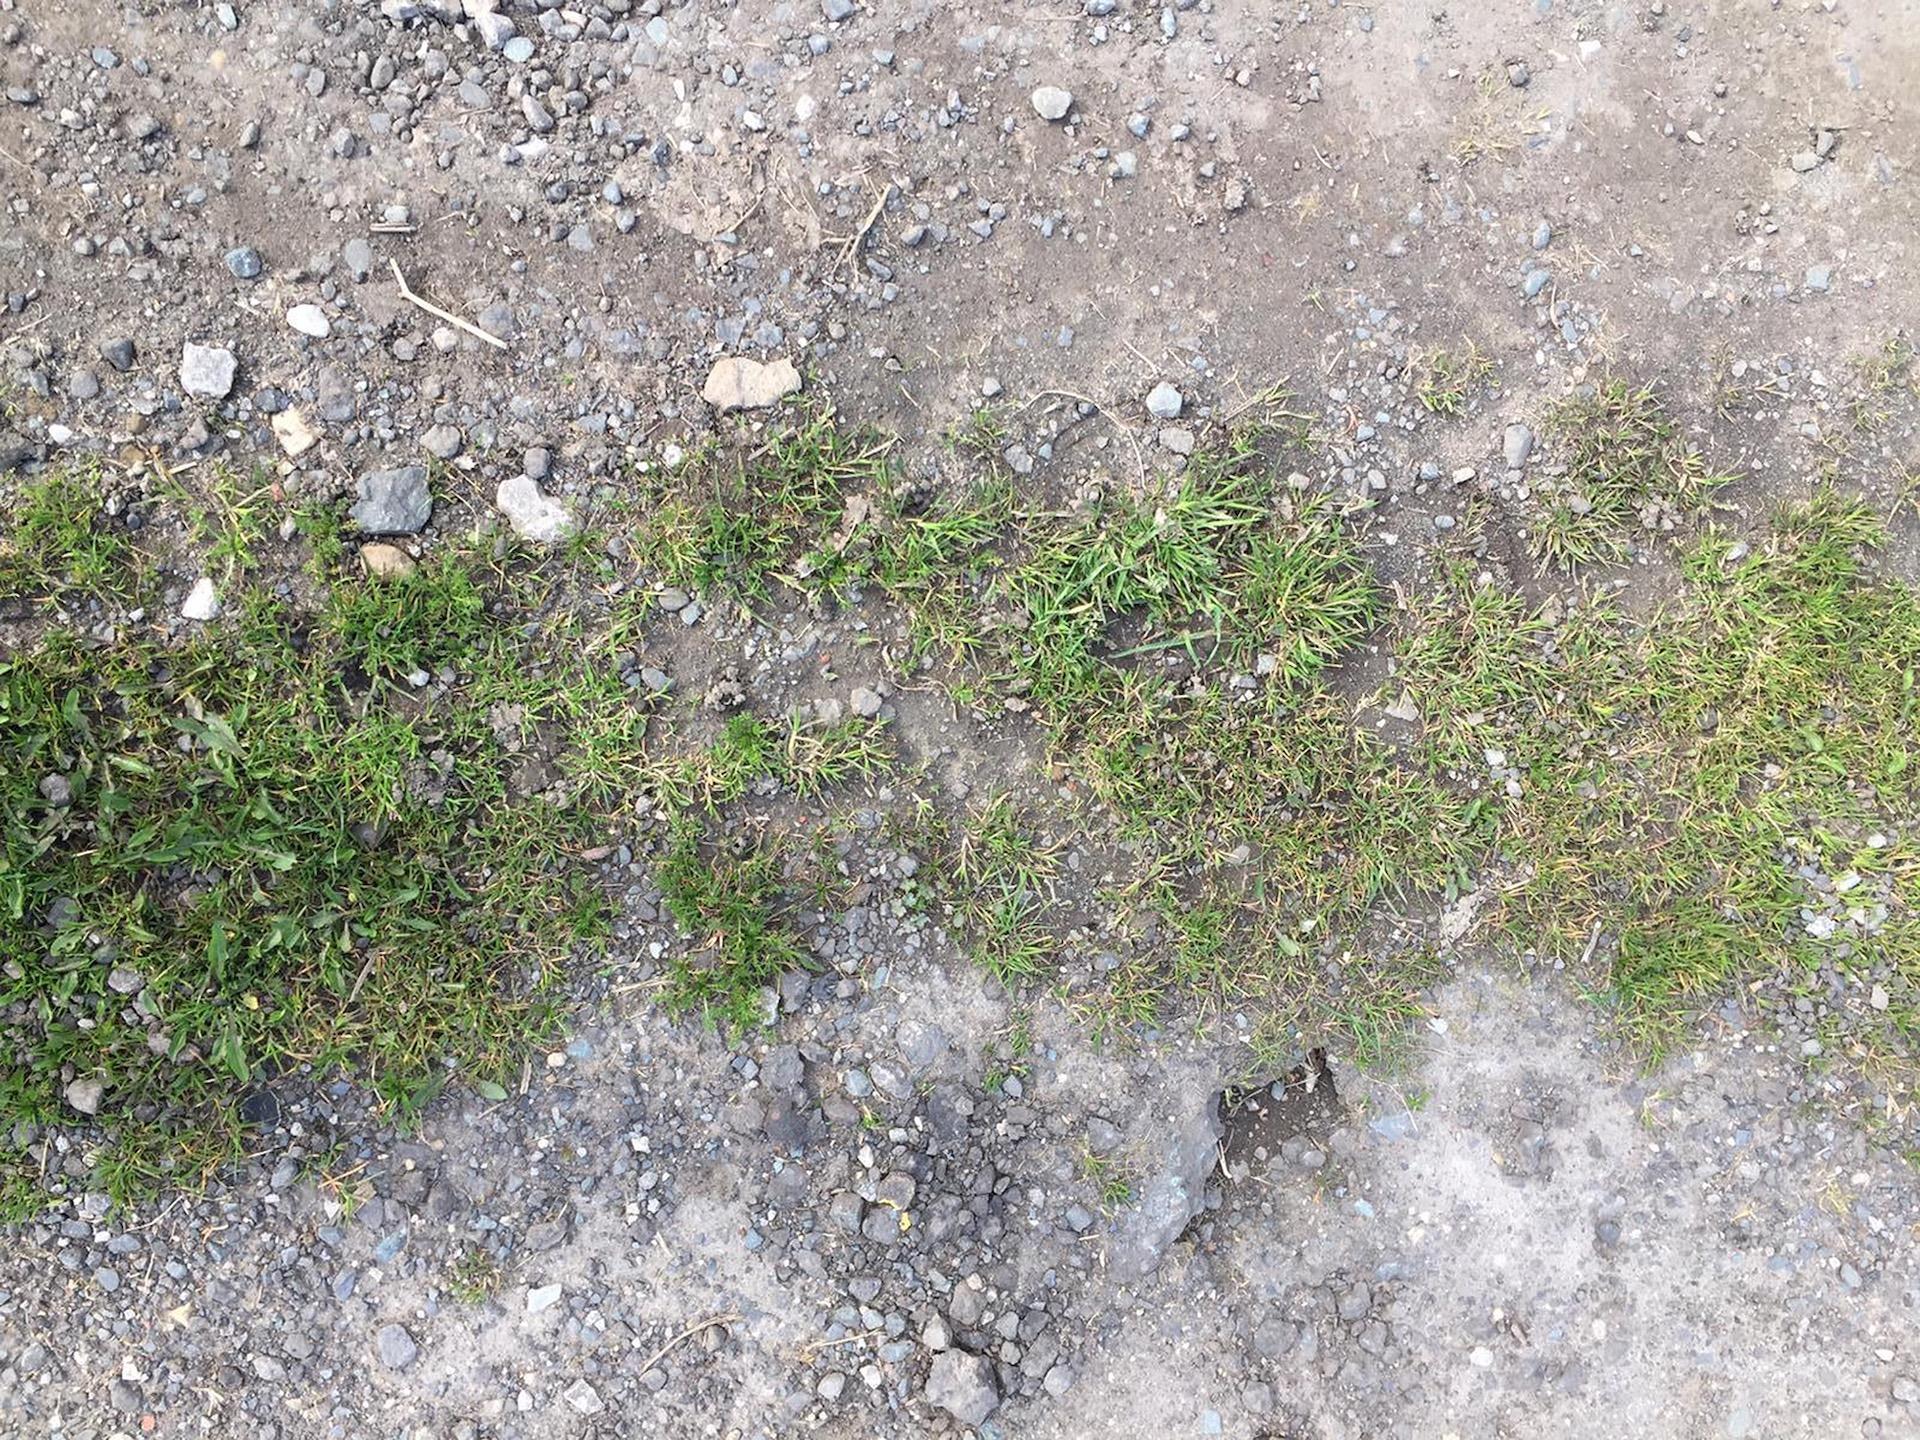 Kahal-Grass-12x16cm